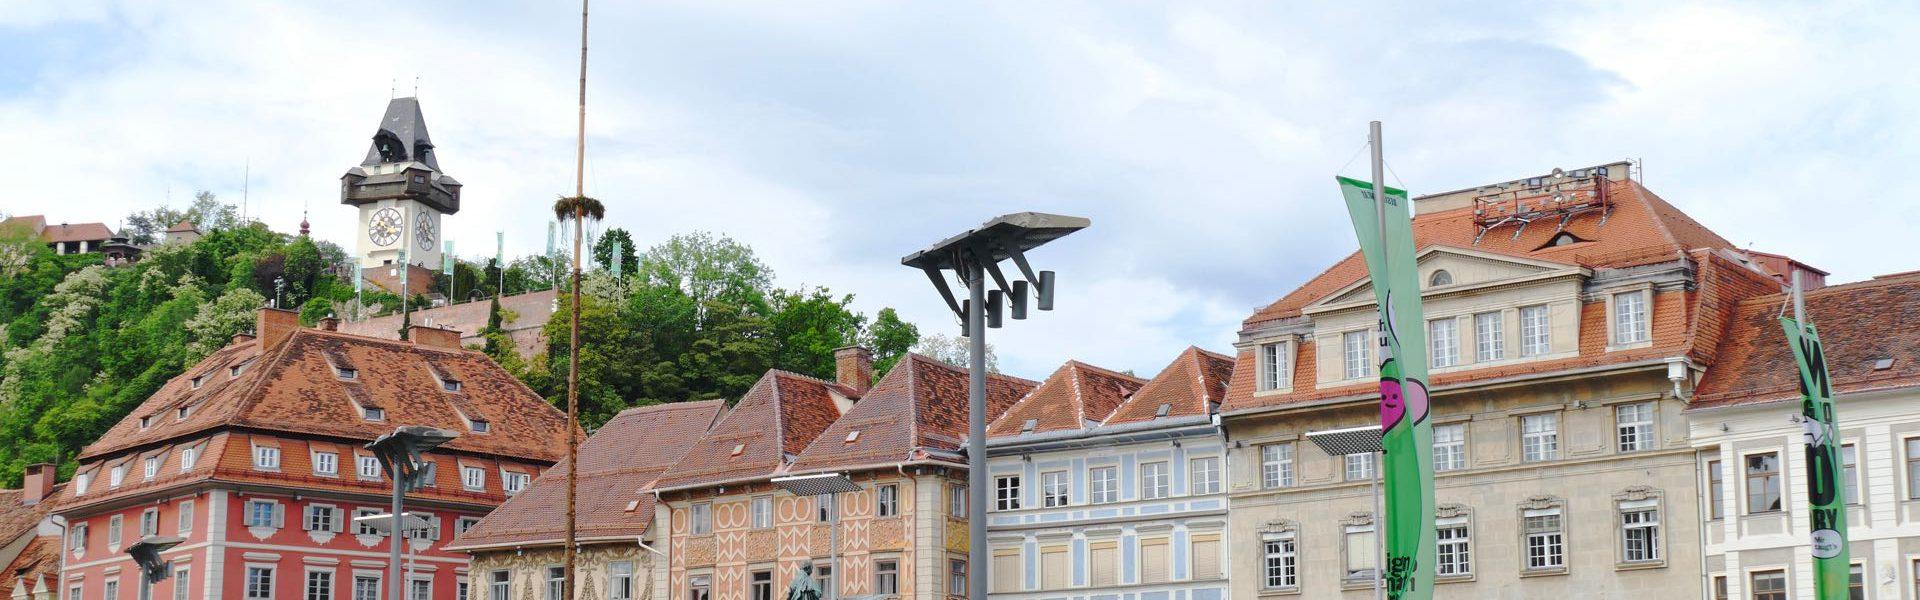 Graz main square clock tower